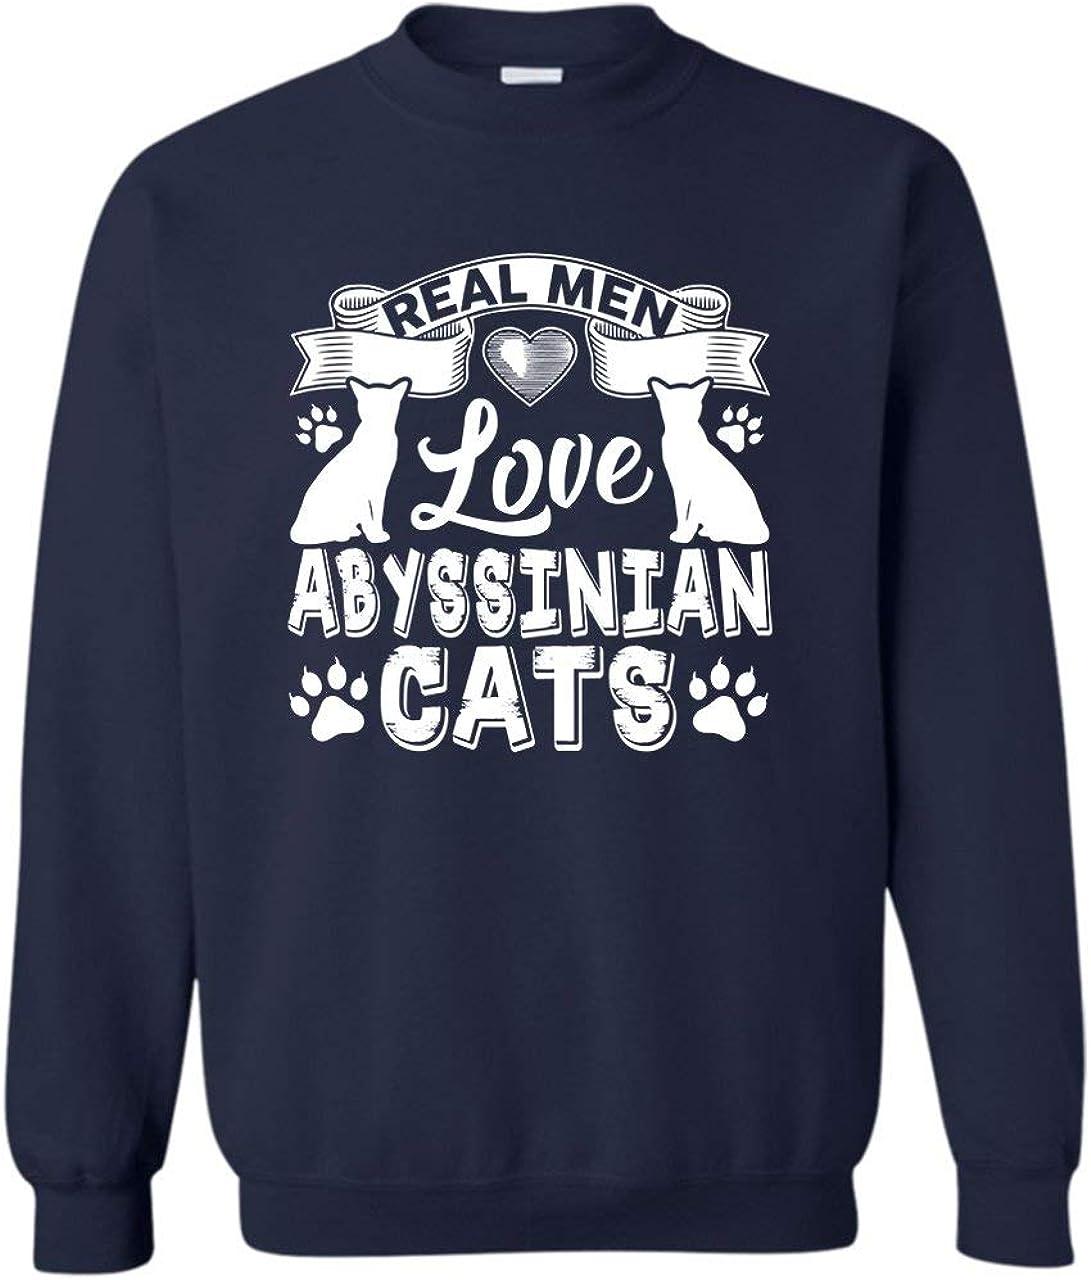 Real Men Love Abyssinian Inexpensive Cats Crewneck Unisex Popular Sweatshir Pullover